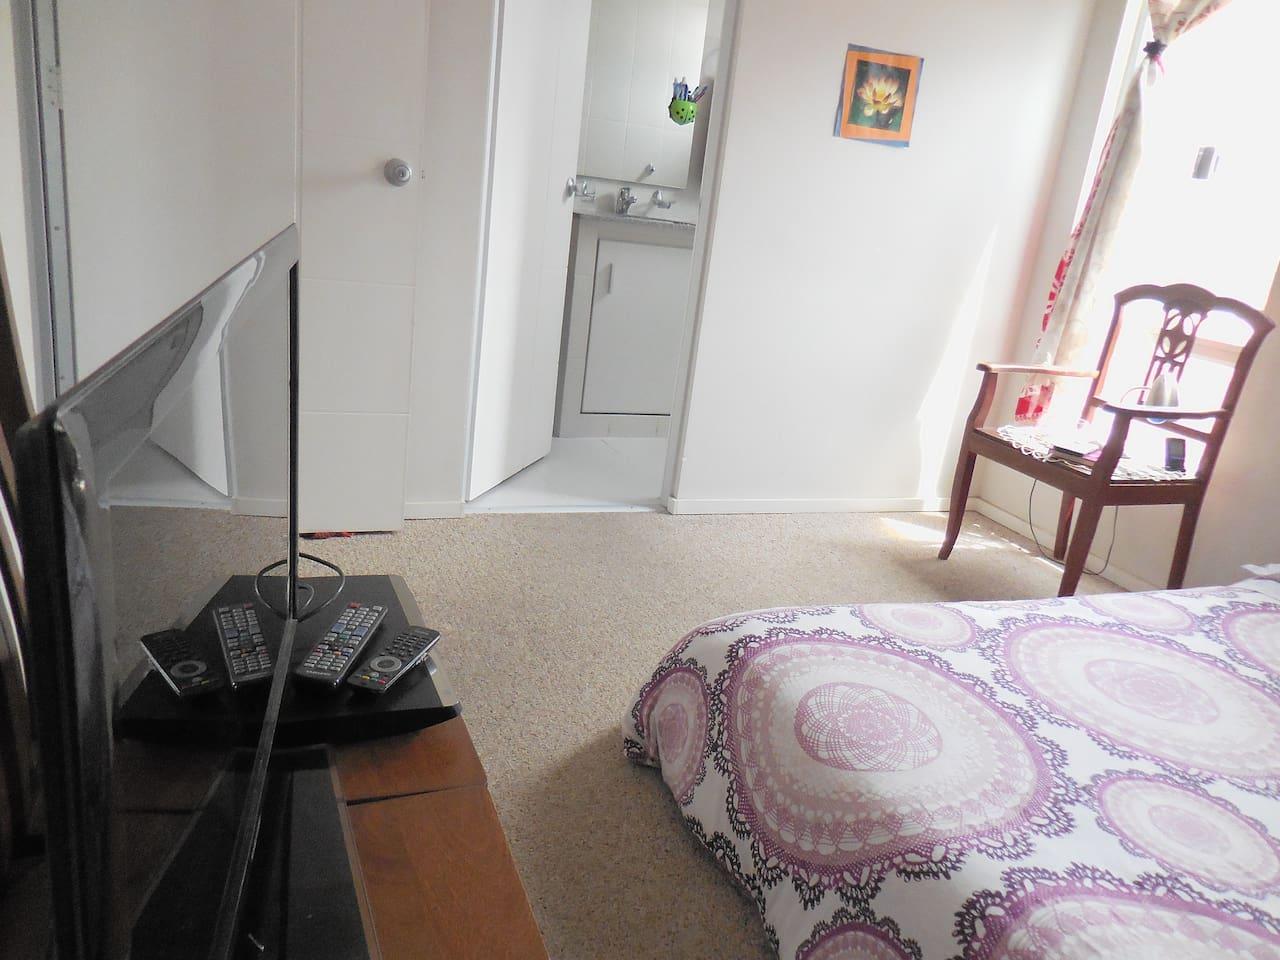 Habitación 1: Moderna e iluminada, con baño privado y televisión.